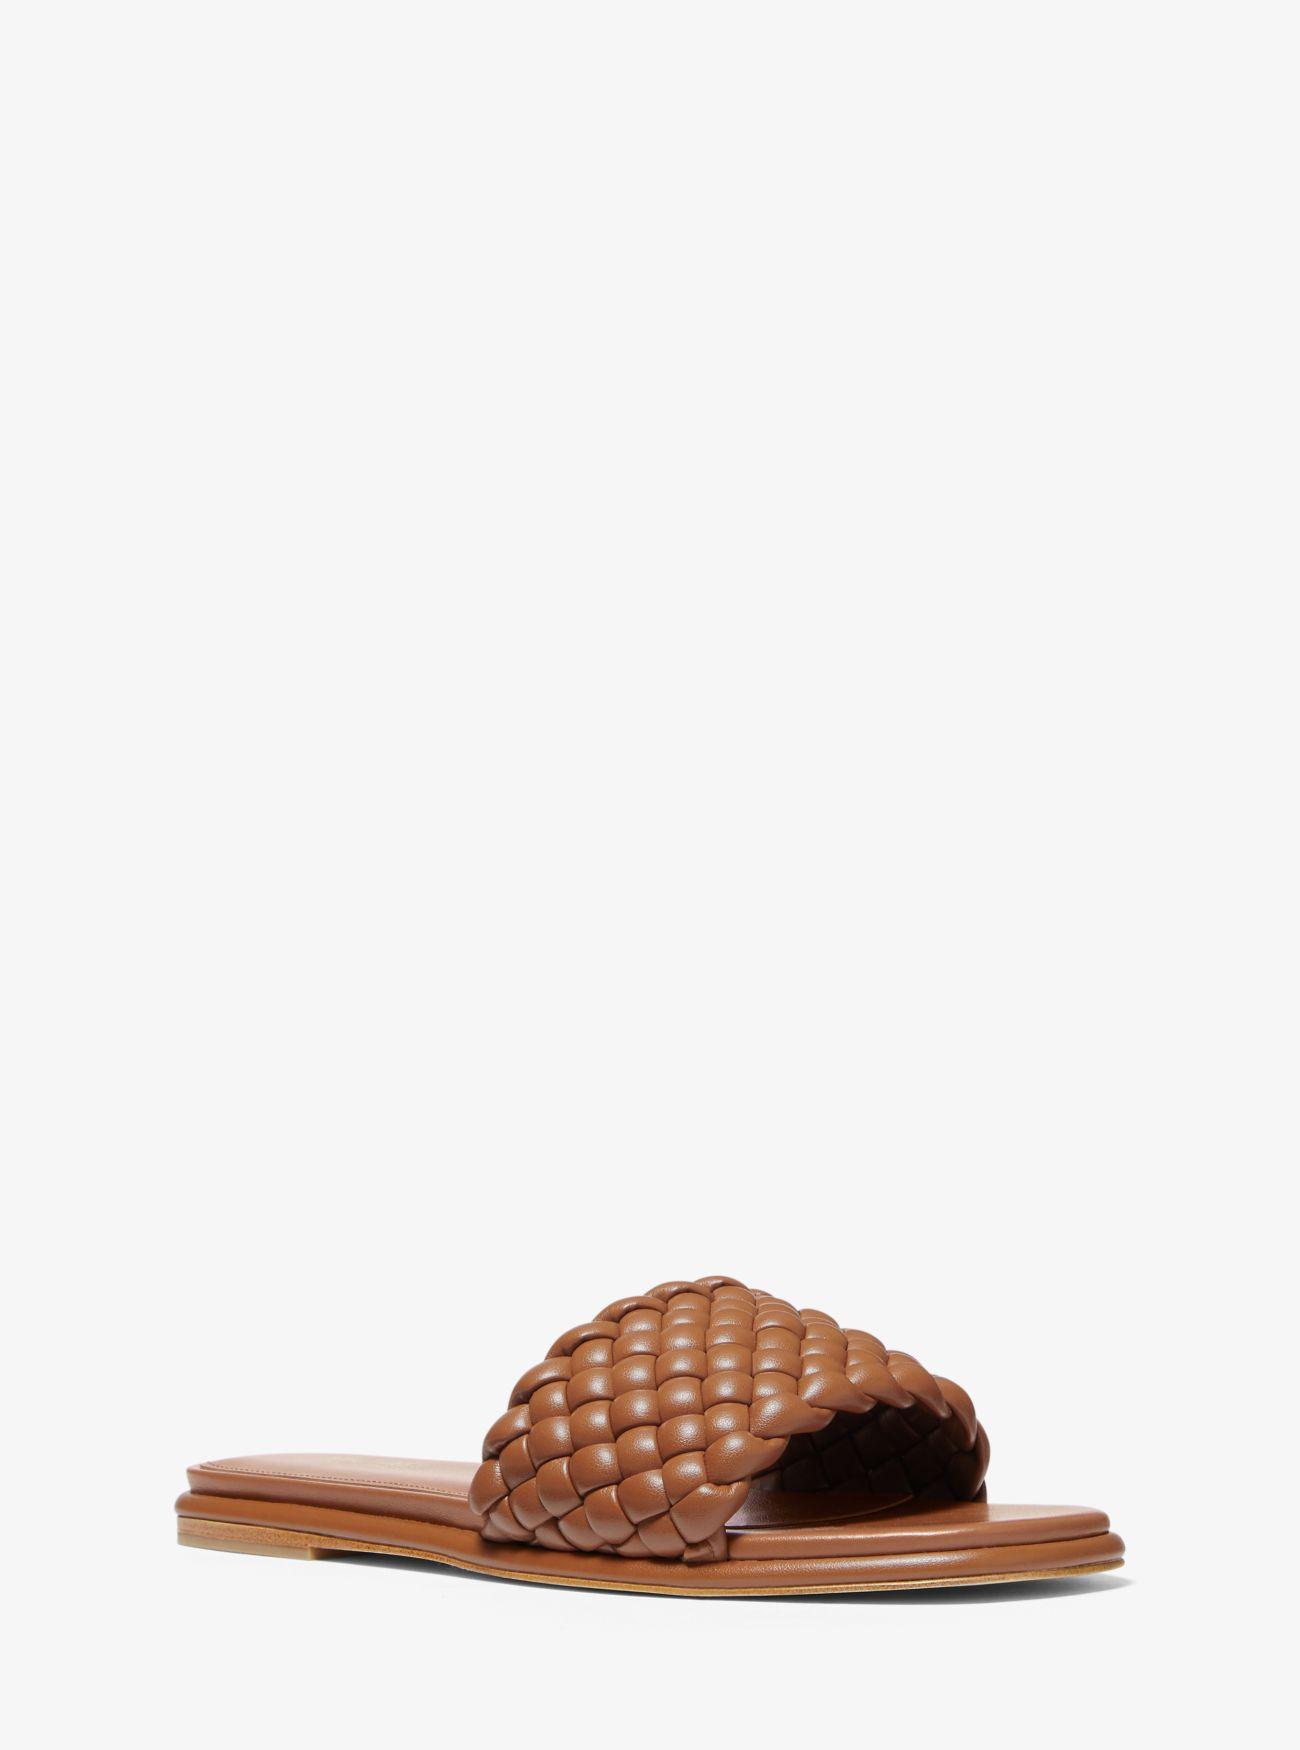 Sandalia trenzada marrón